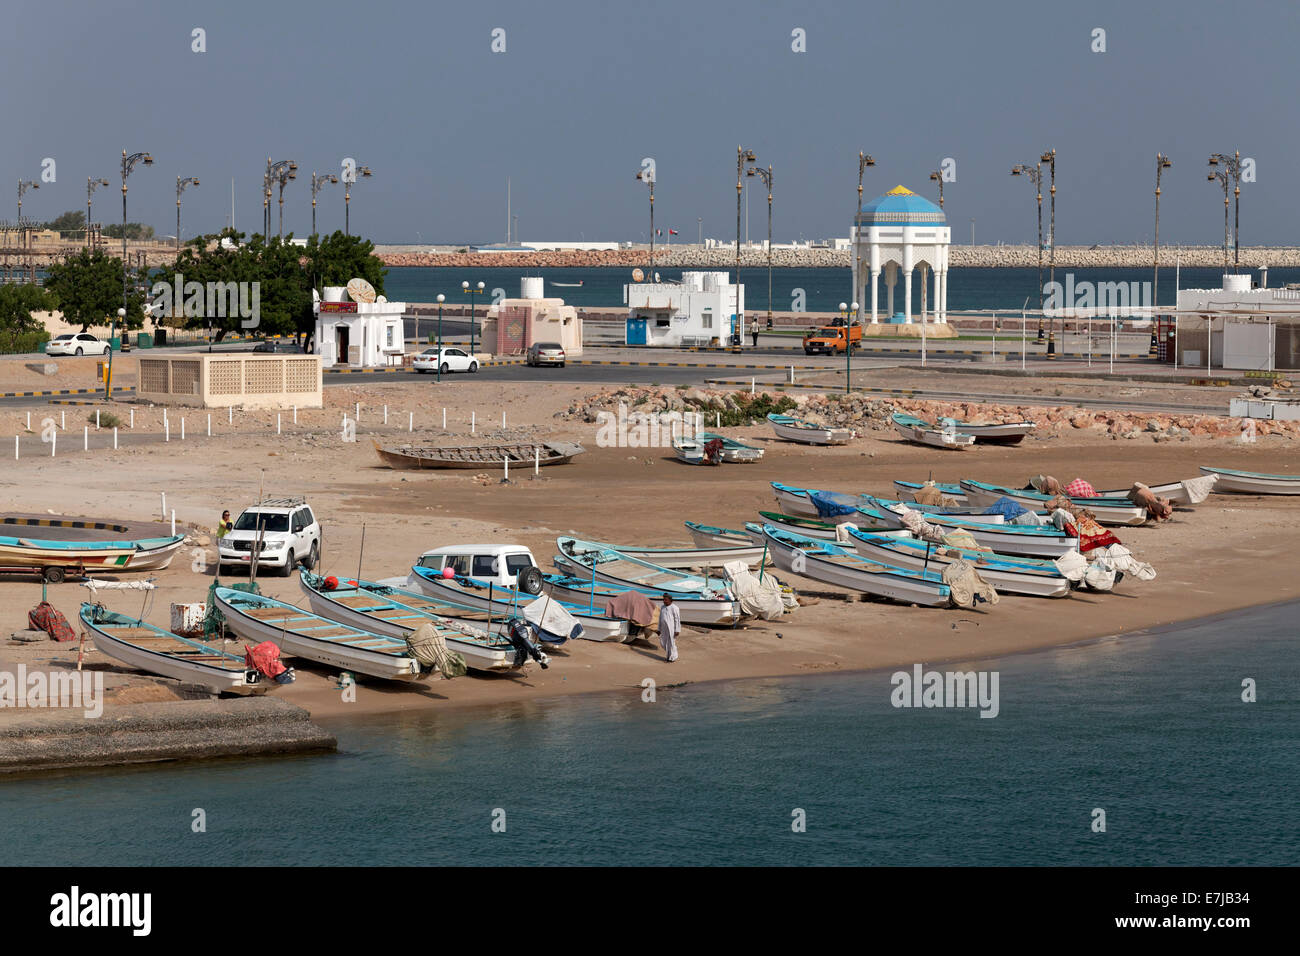 Fishing boats on the beach, near Sur, Ash Sharqiyah province, Sultanate of Oman, Arabian Peninsula - Stock Image